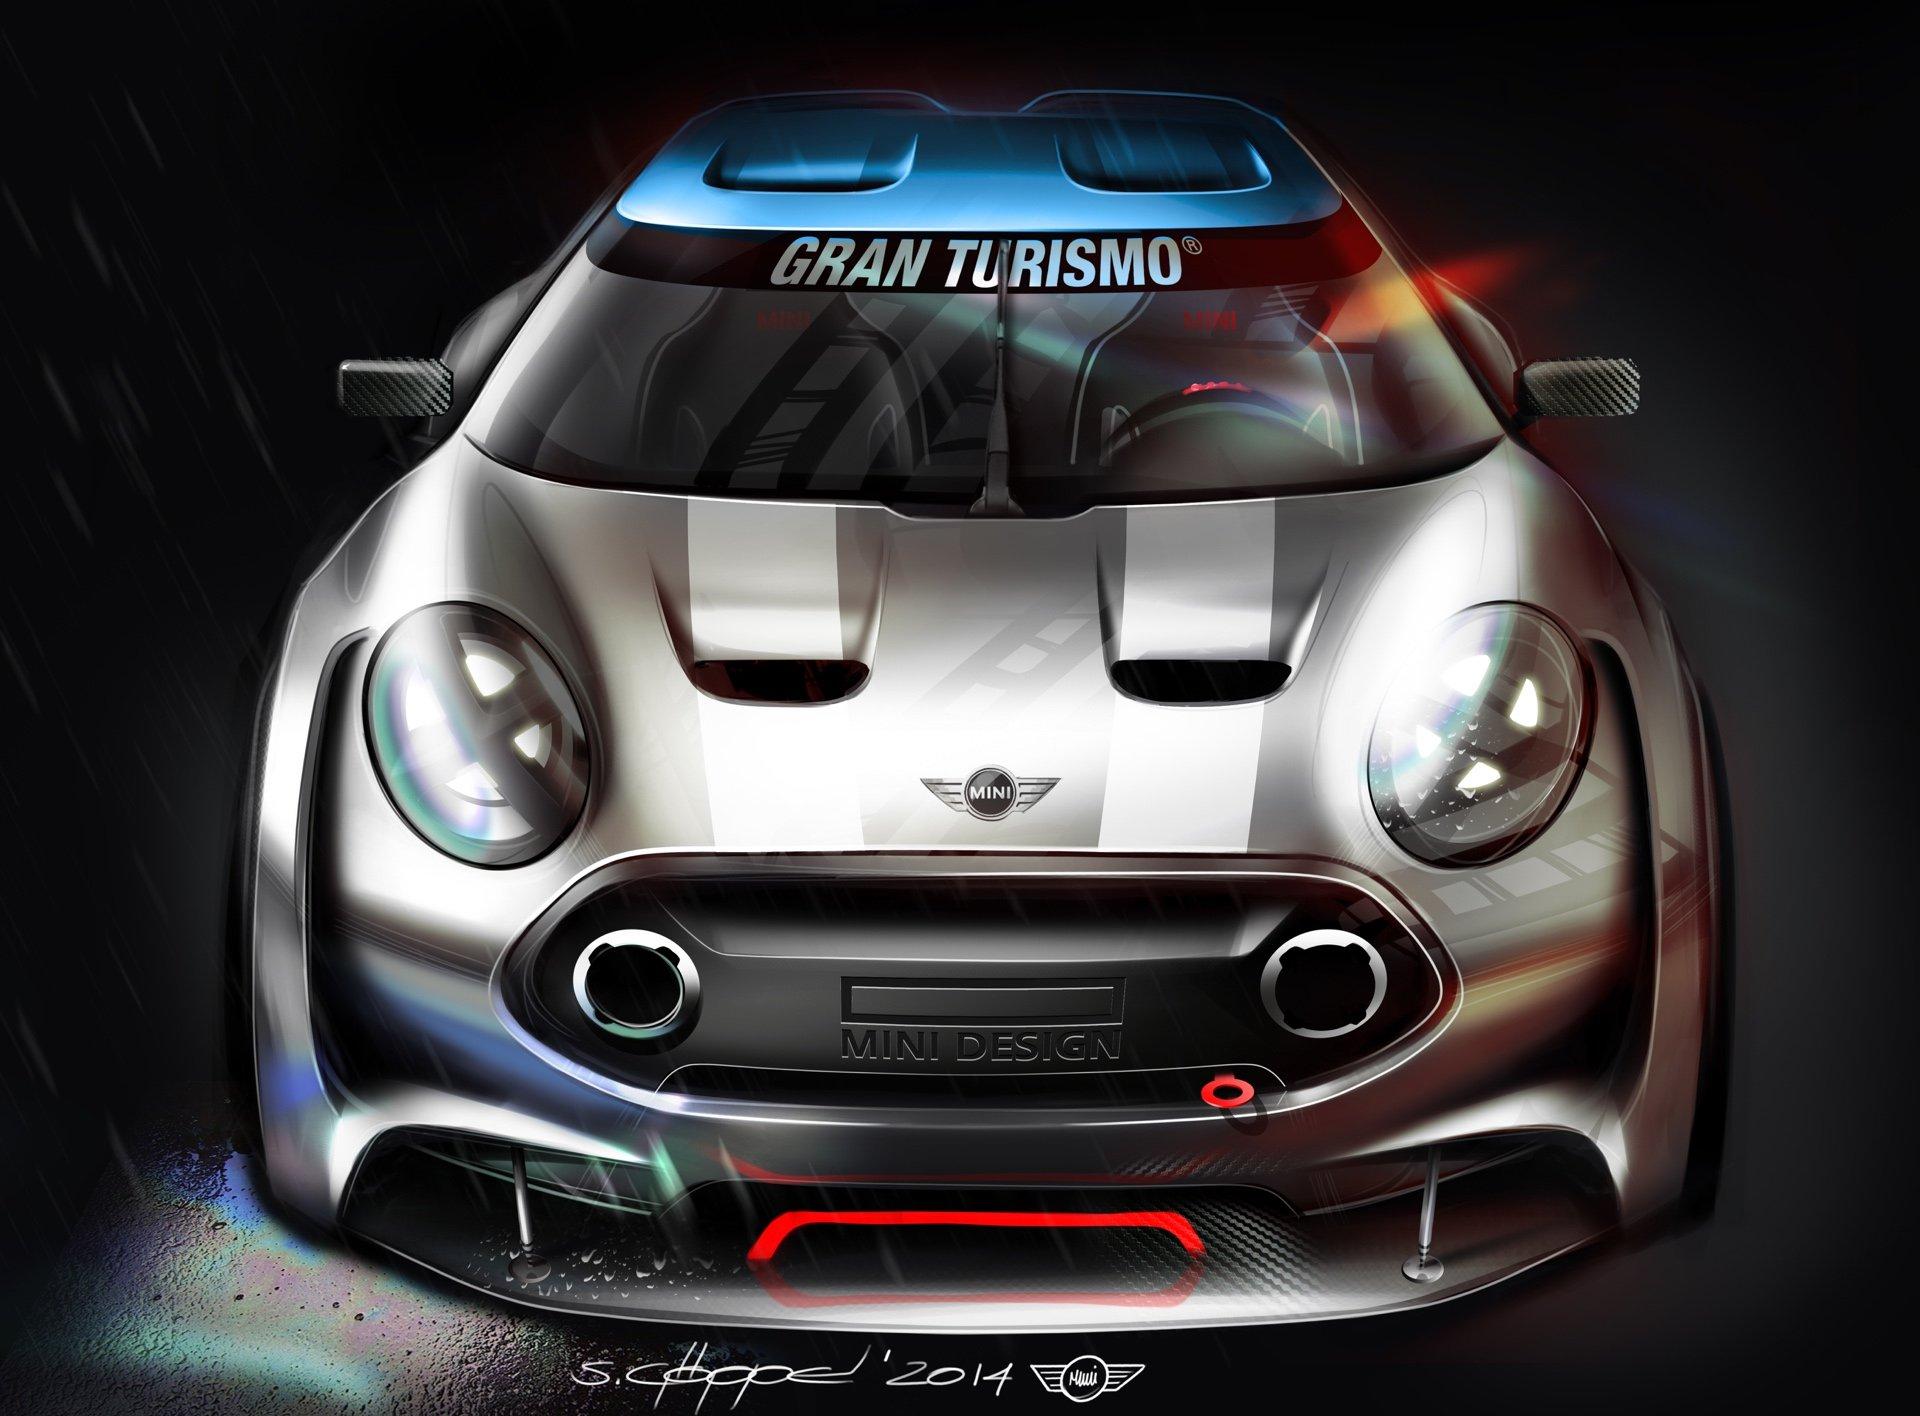 MINI разработала концепт-кар для игры Gran Turismo